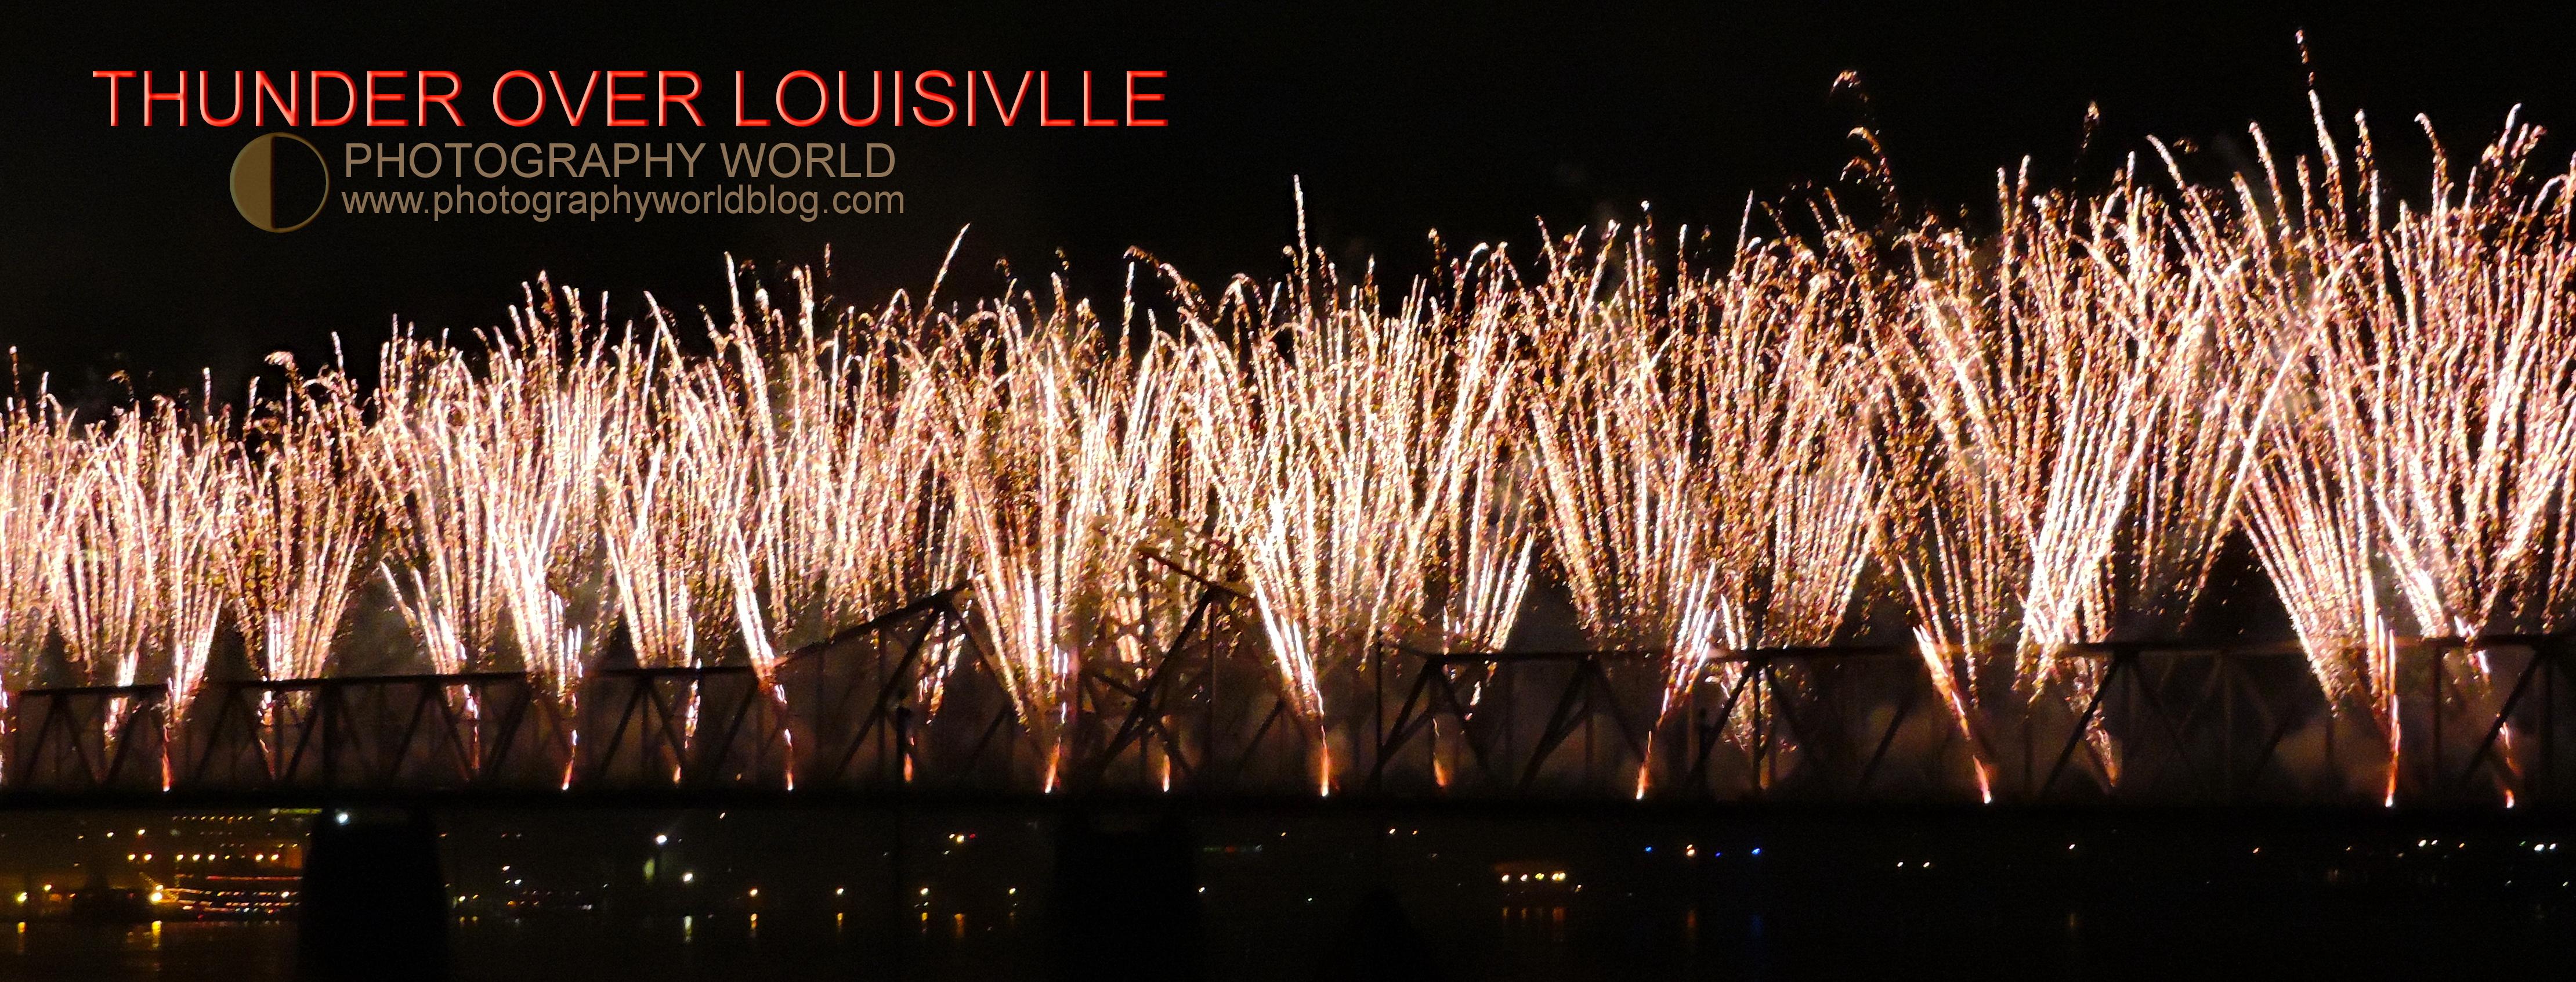 © THUNDER OVER LOUISVILLE. Fireworks off the second street bridge. Photograph by Mina Thevenin @photographyworld.org